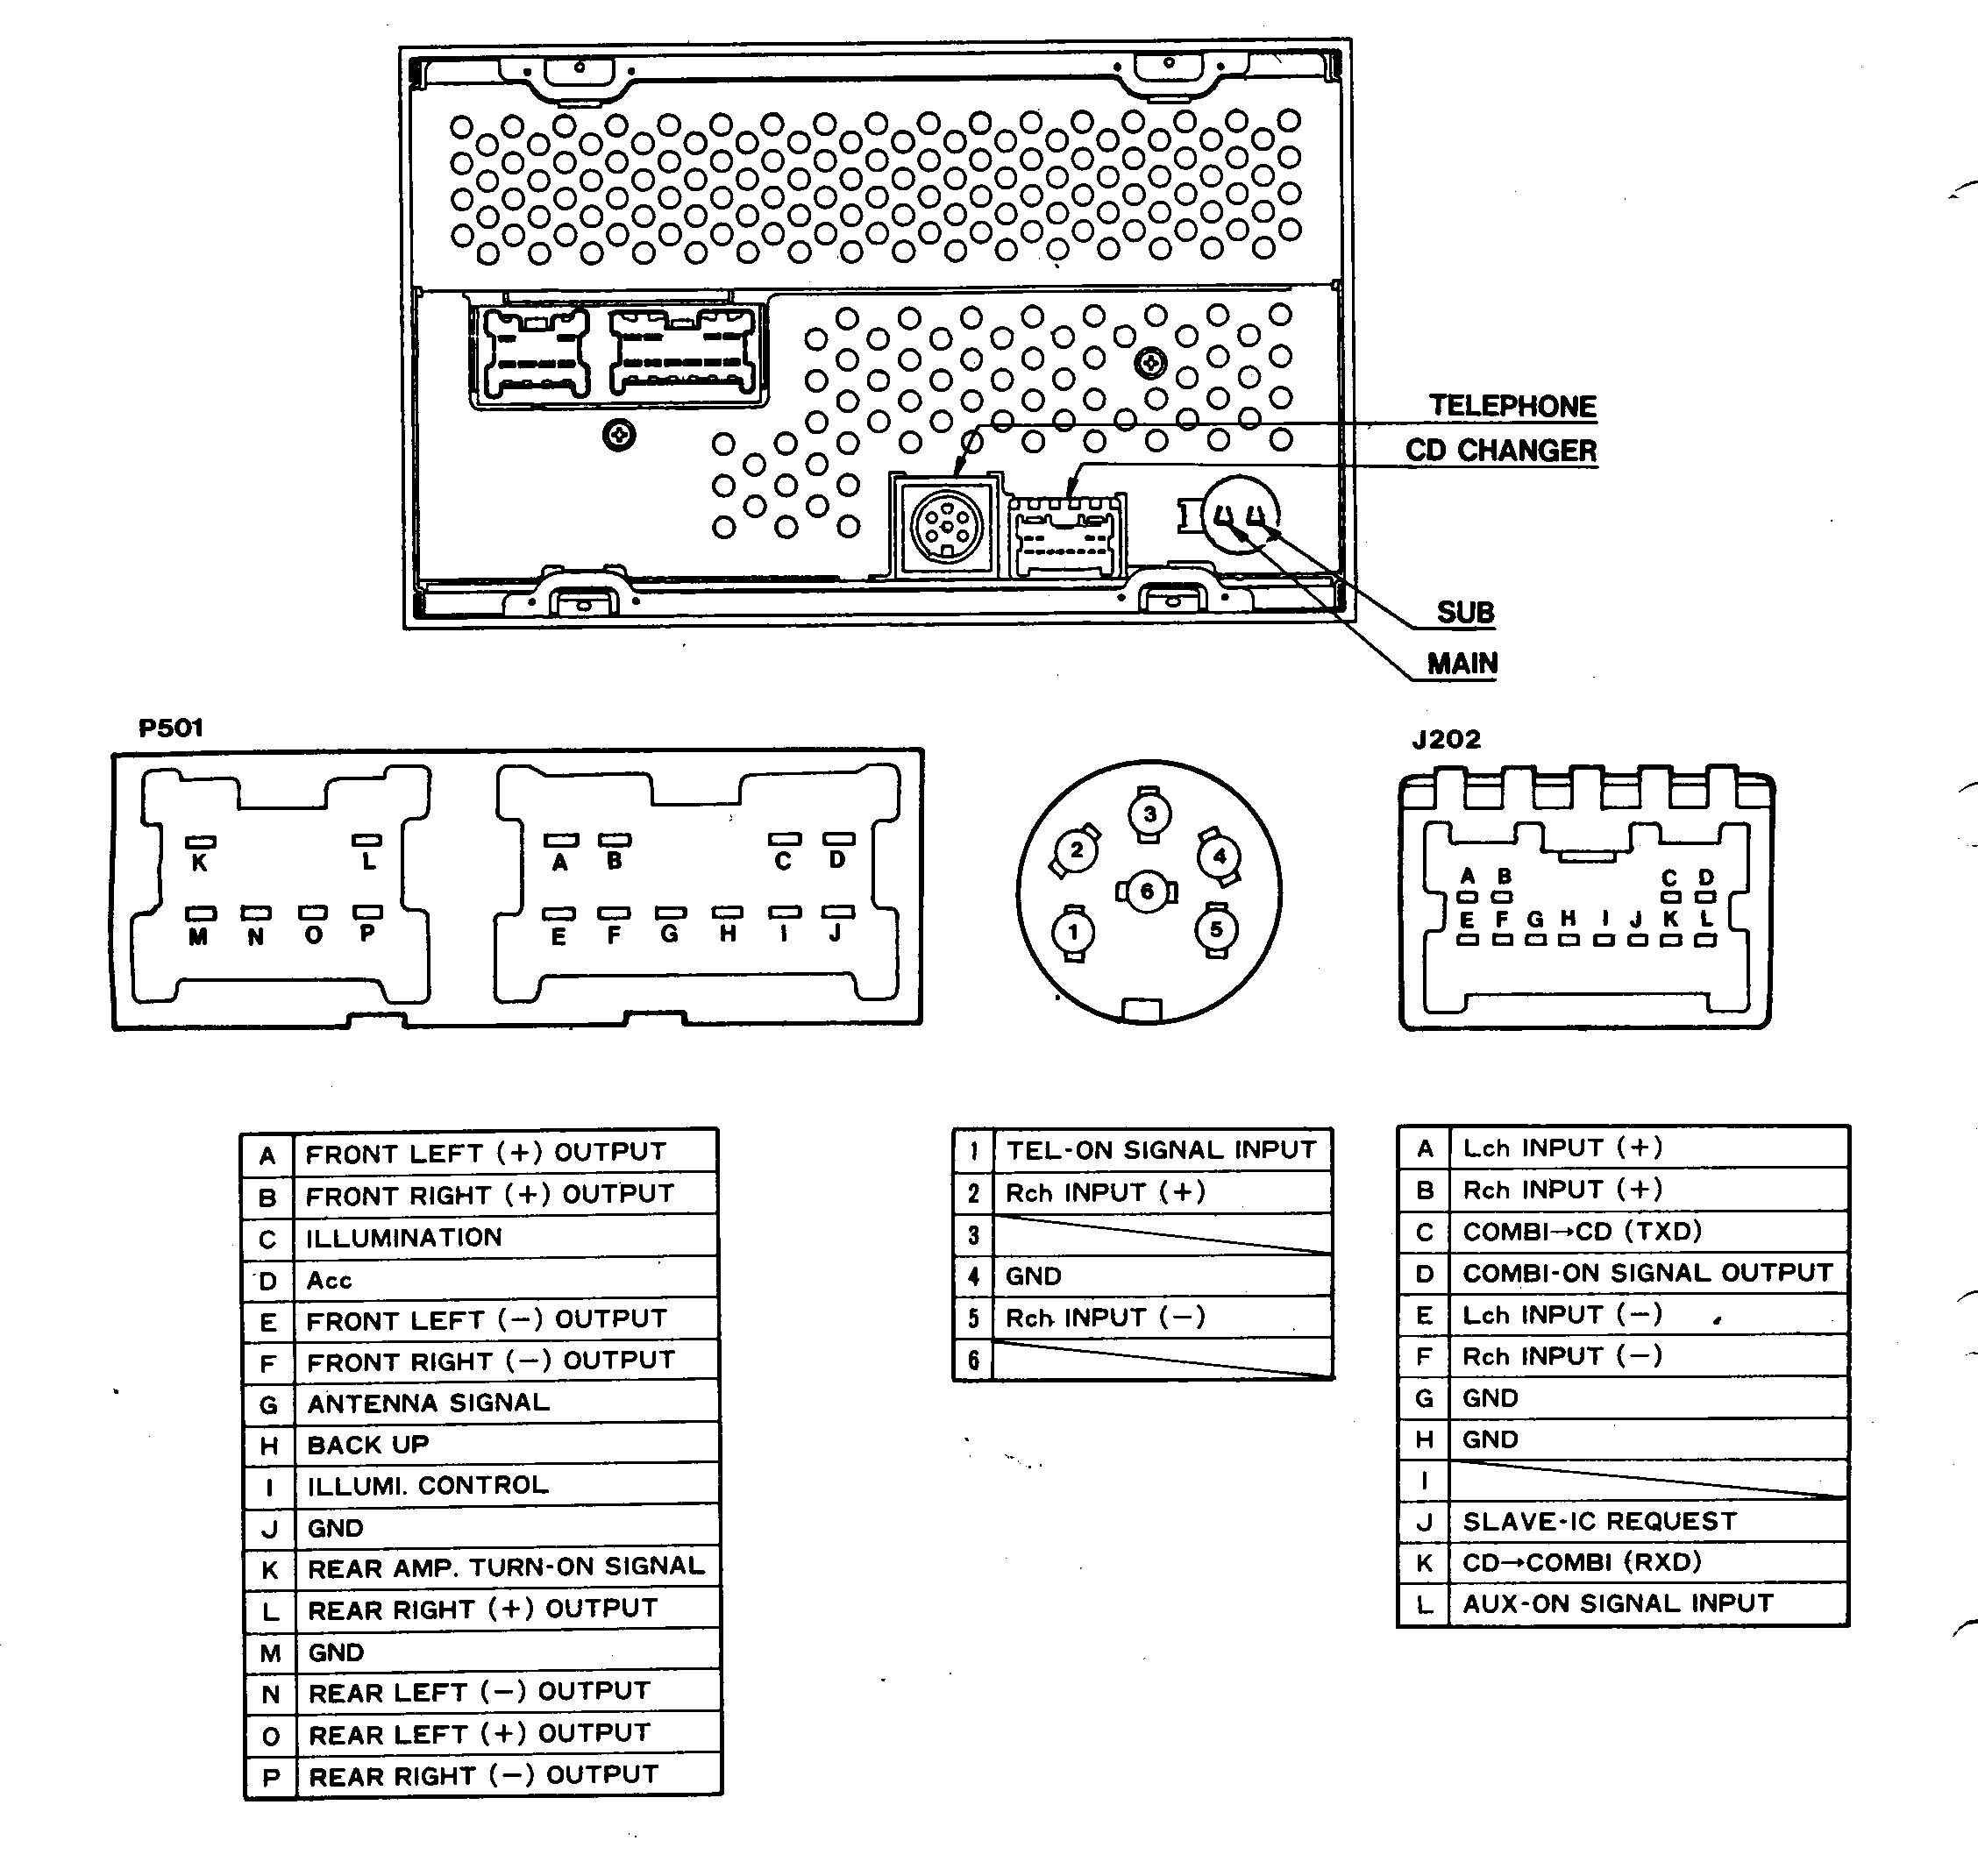 Nissan 350Z Radio Wiring Diagram | Wiring Diagram - 2005 Jeep Grand Cherokee Radio Wiring Diagram